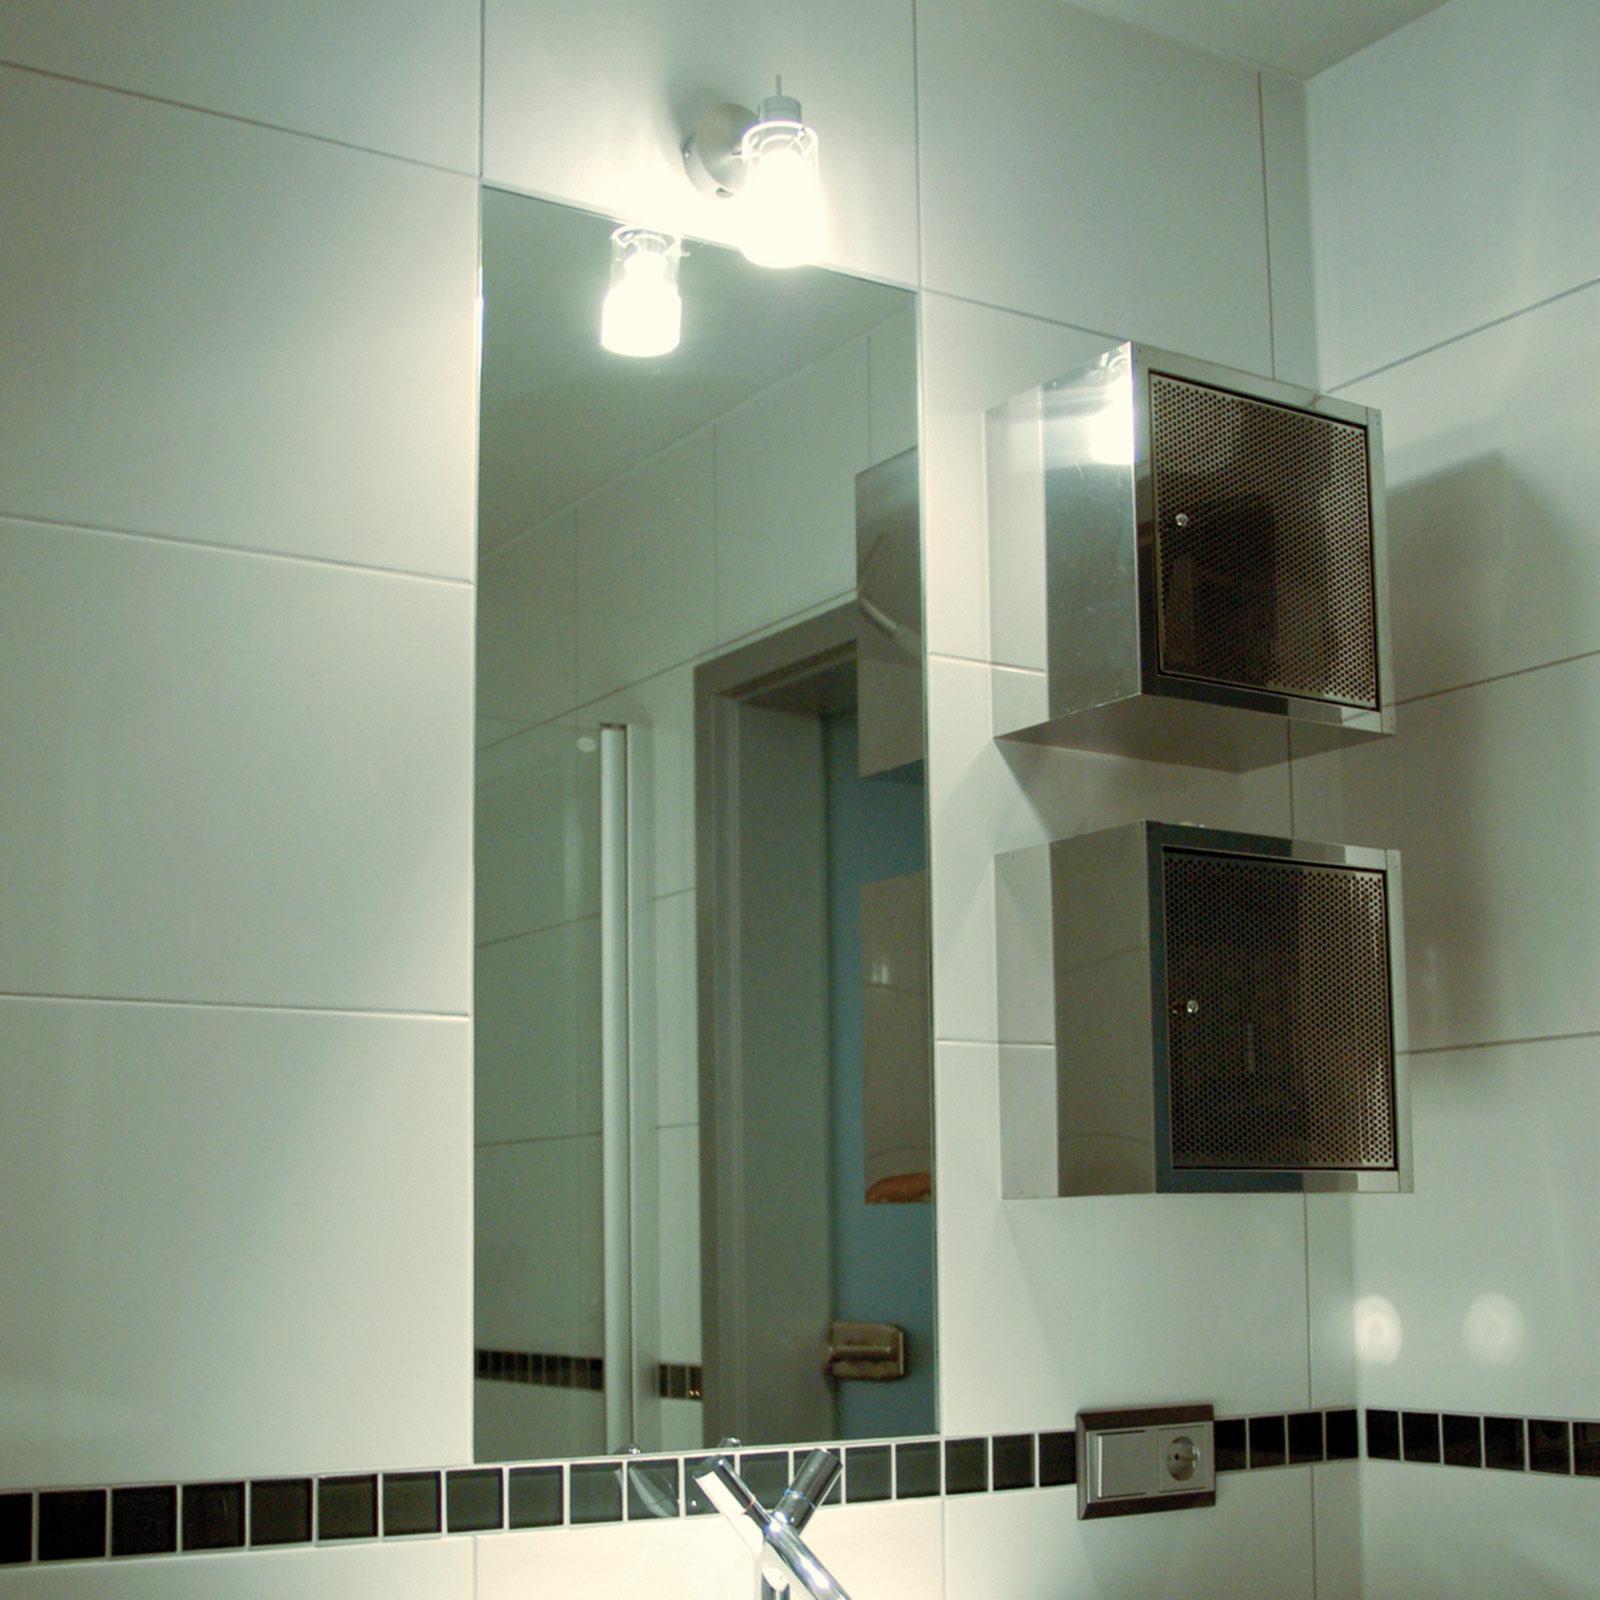 d-c fix Klebefolie - Spiegelfolie - 45x150 cm